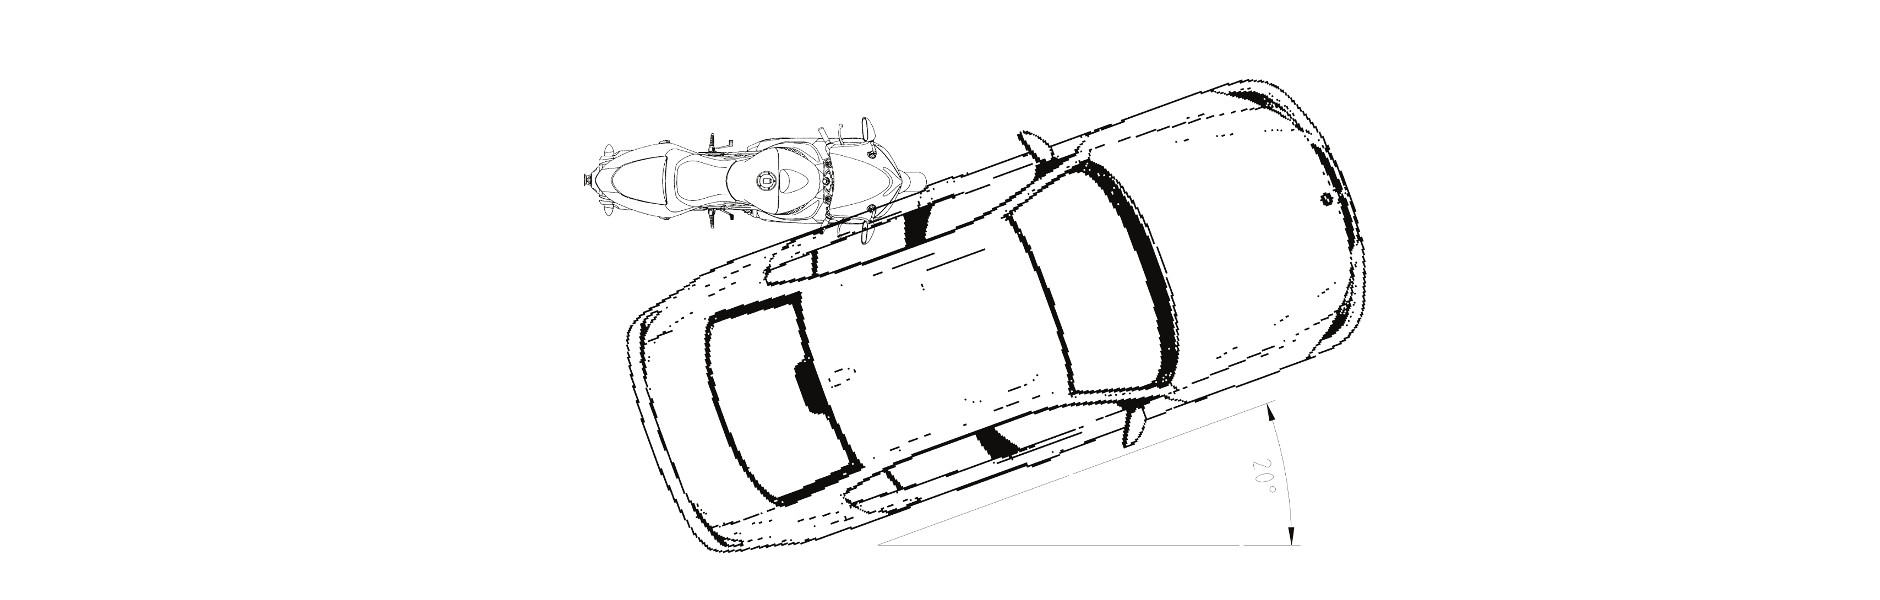 1948 Farmall M Wiring Diagram Ihc Wiring Diagram Motorcycle And Car